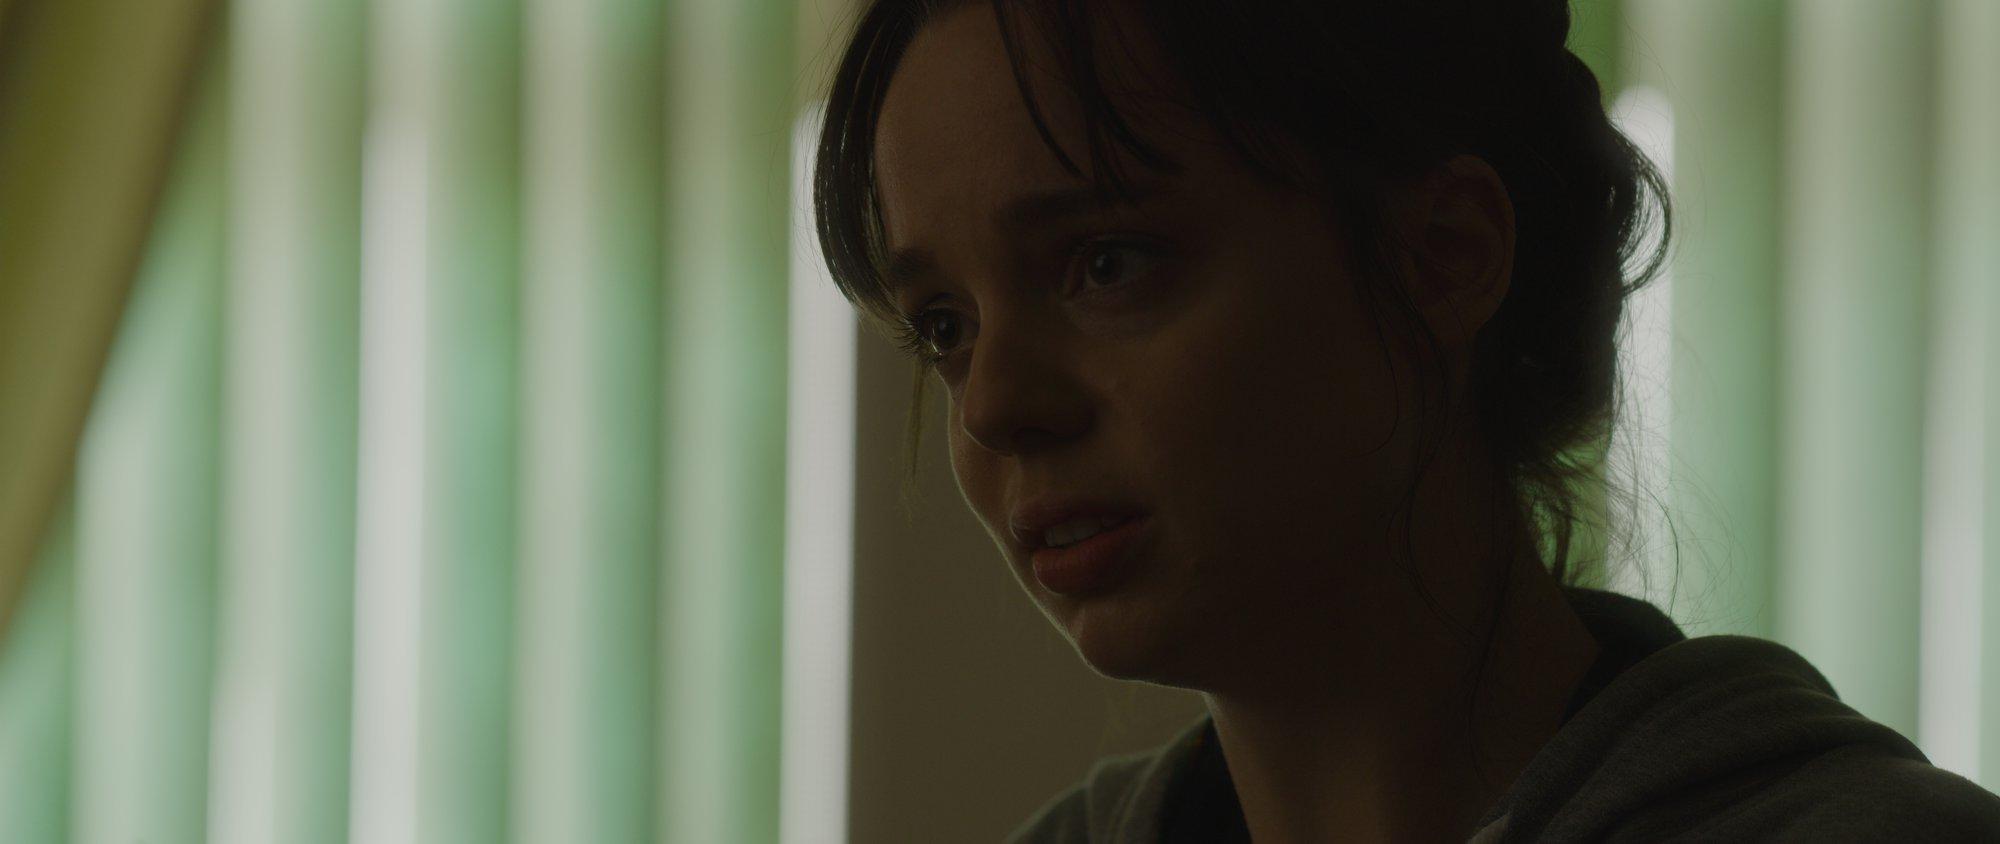 24 Piedmont Drive - Emily Haine as Scottie